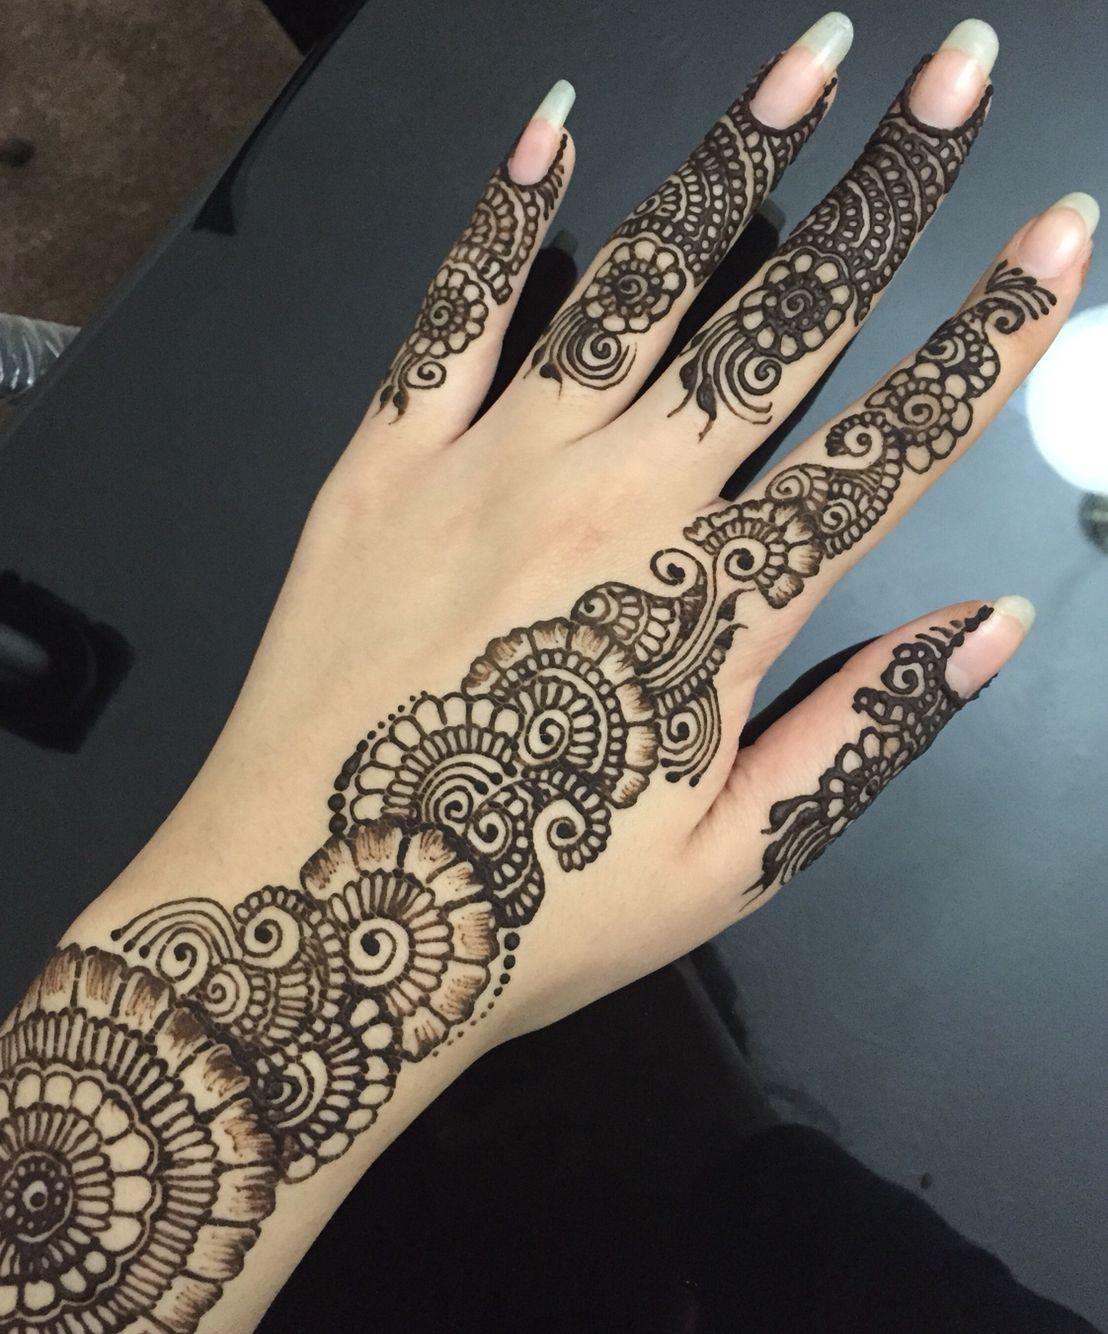 Simple floral henna design with finger details ️ Mehndi